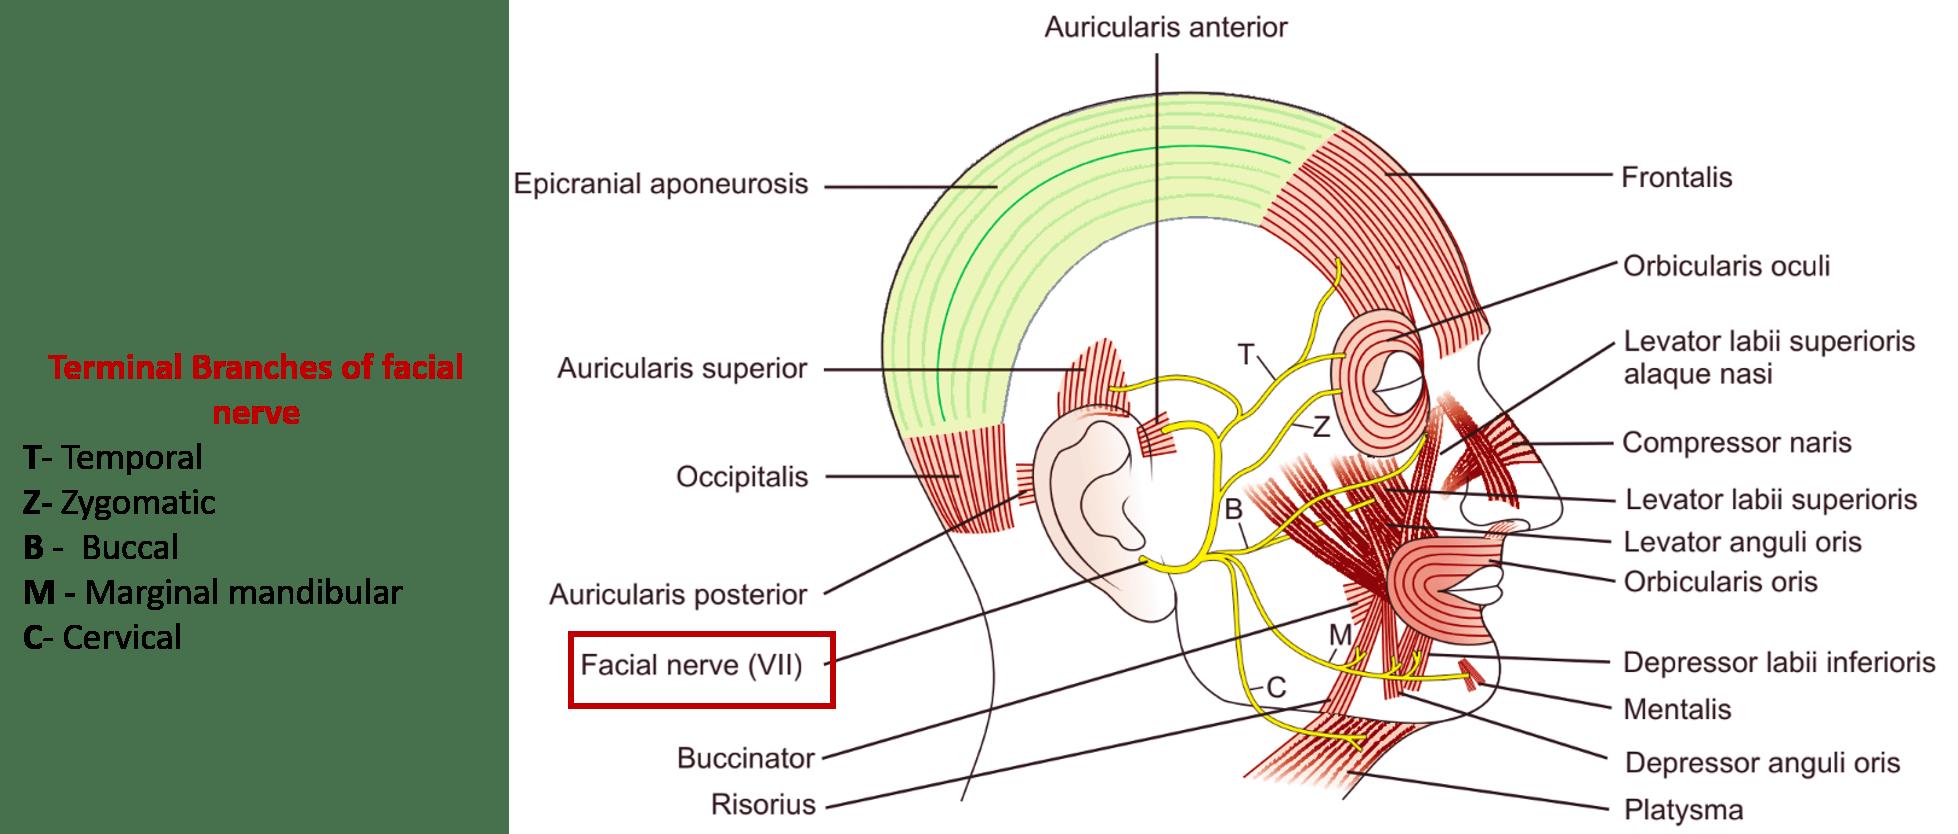 Contemporary Facial Nerve Anatomy Picture Photo - Anatomy Ideas ...